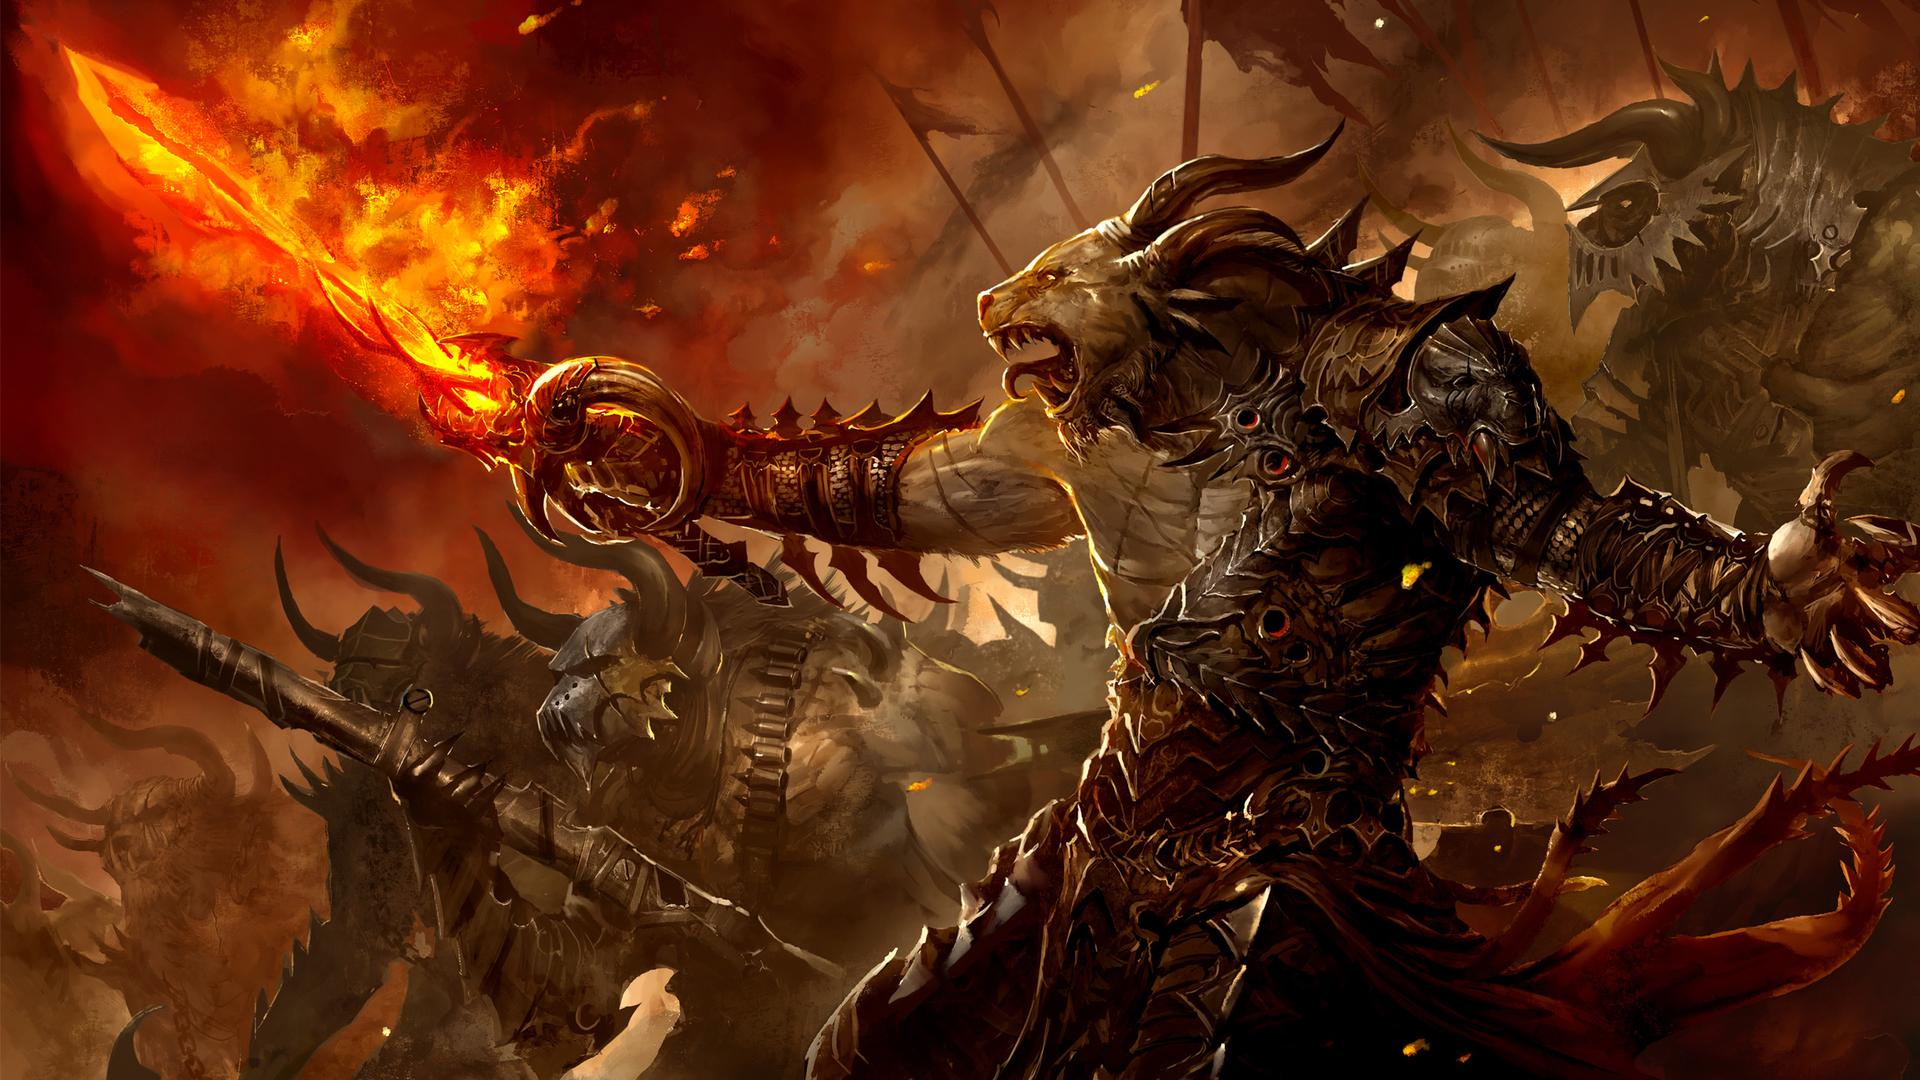 guild_wars_2_charr_by_artfall-d3f3avz.jpg